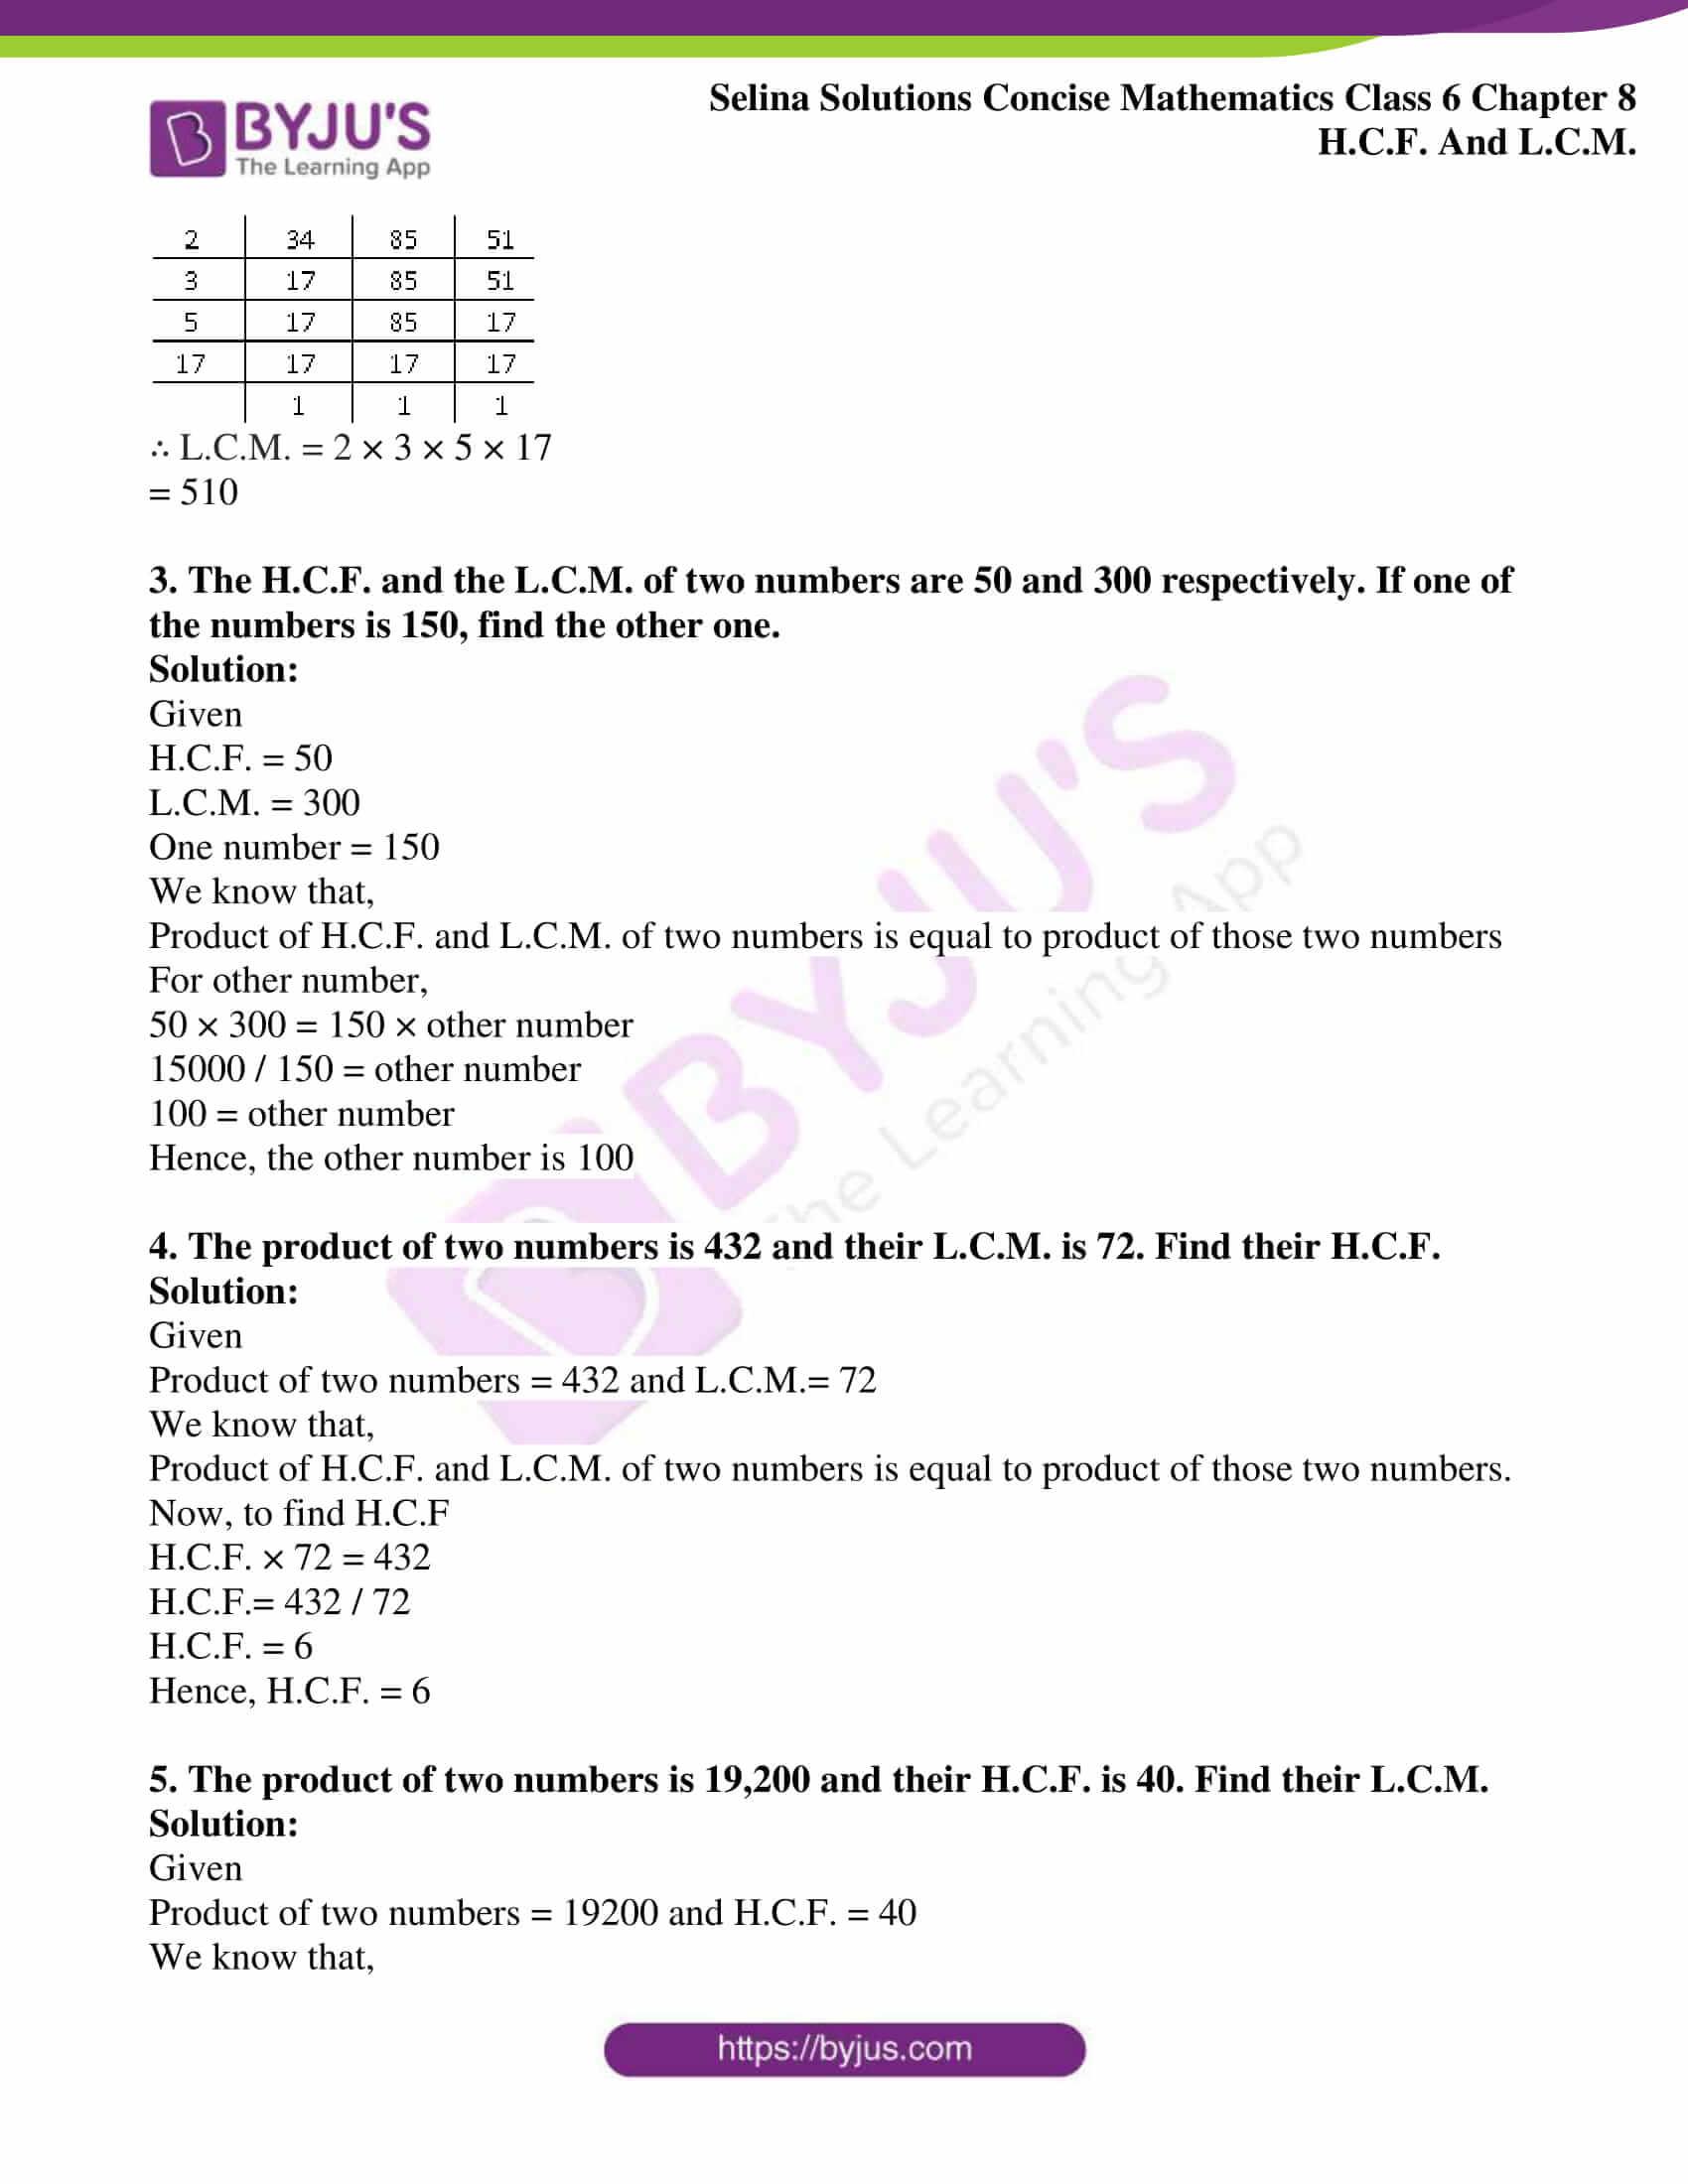 selina sol concise mathematics class 6 ch 8 ex c 4